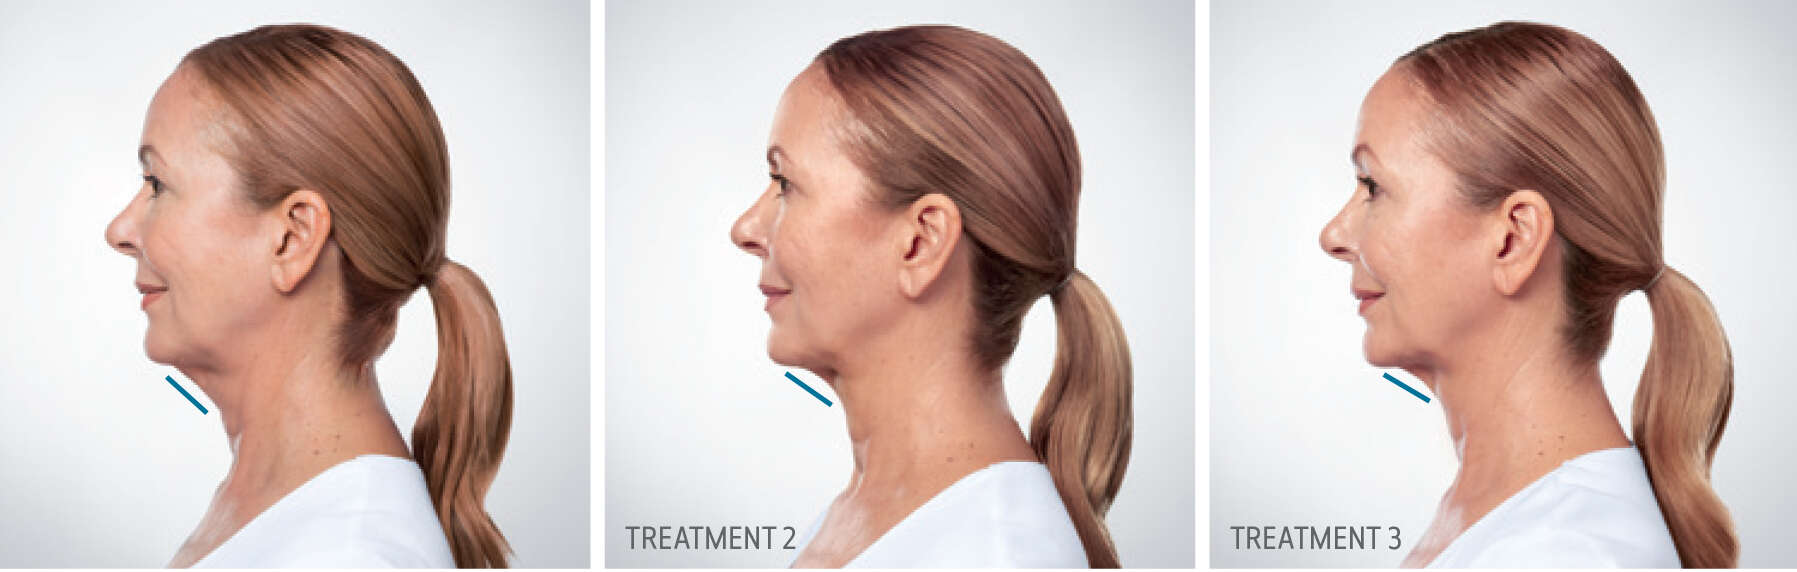 Kybella Treatment Progression